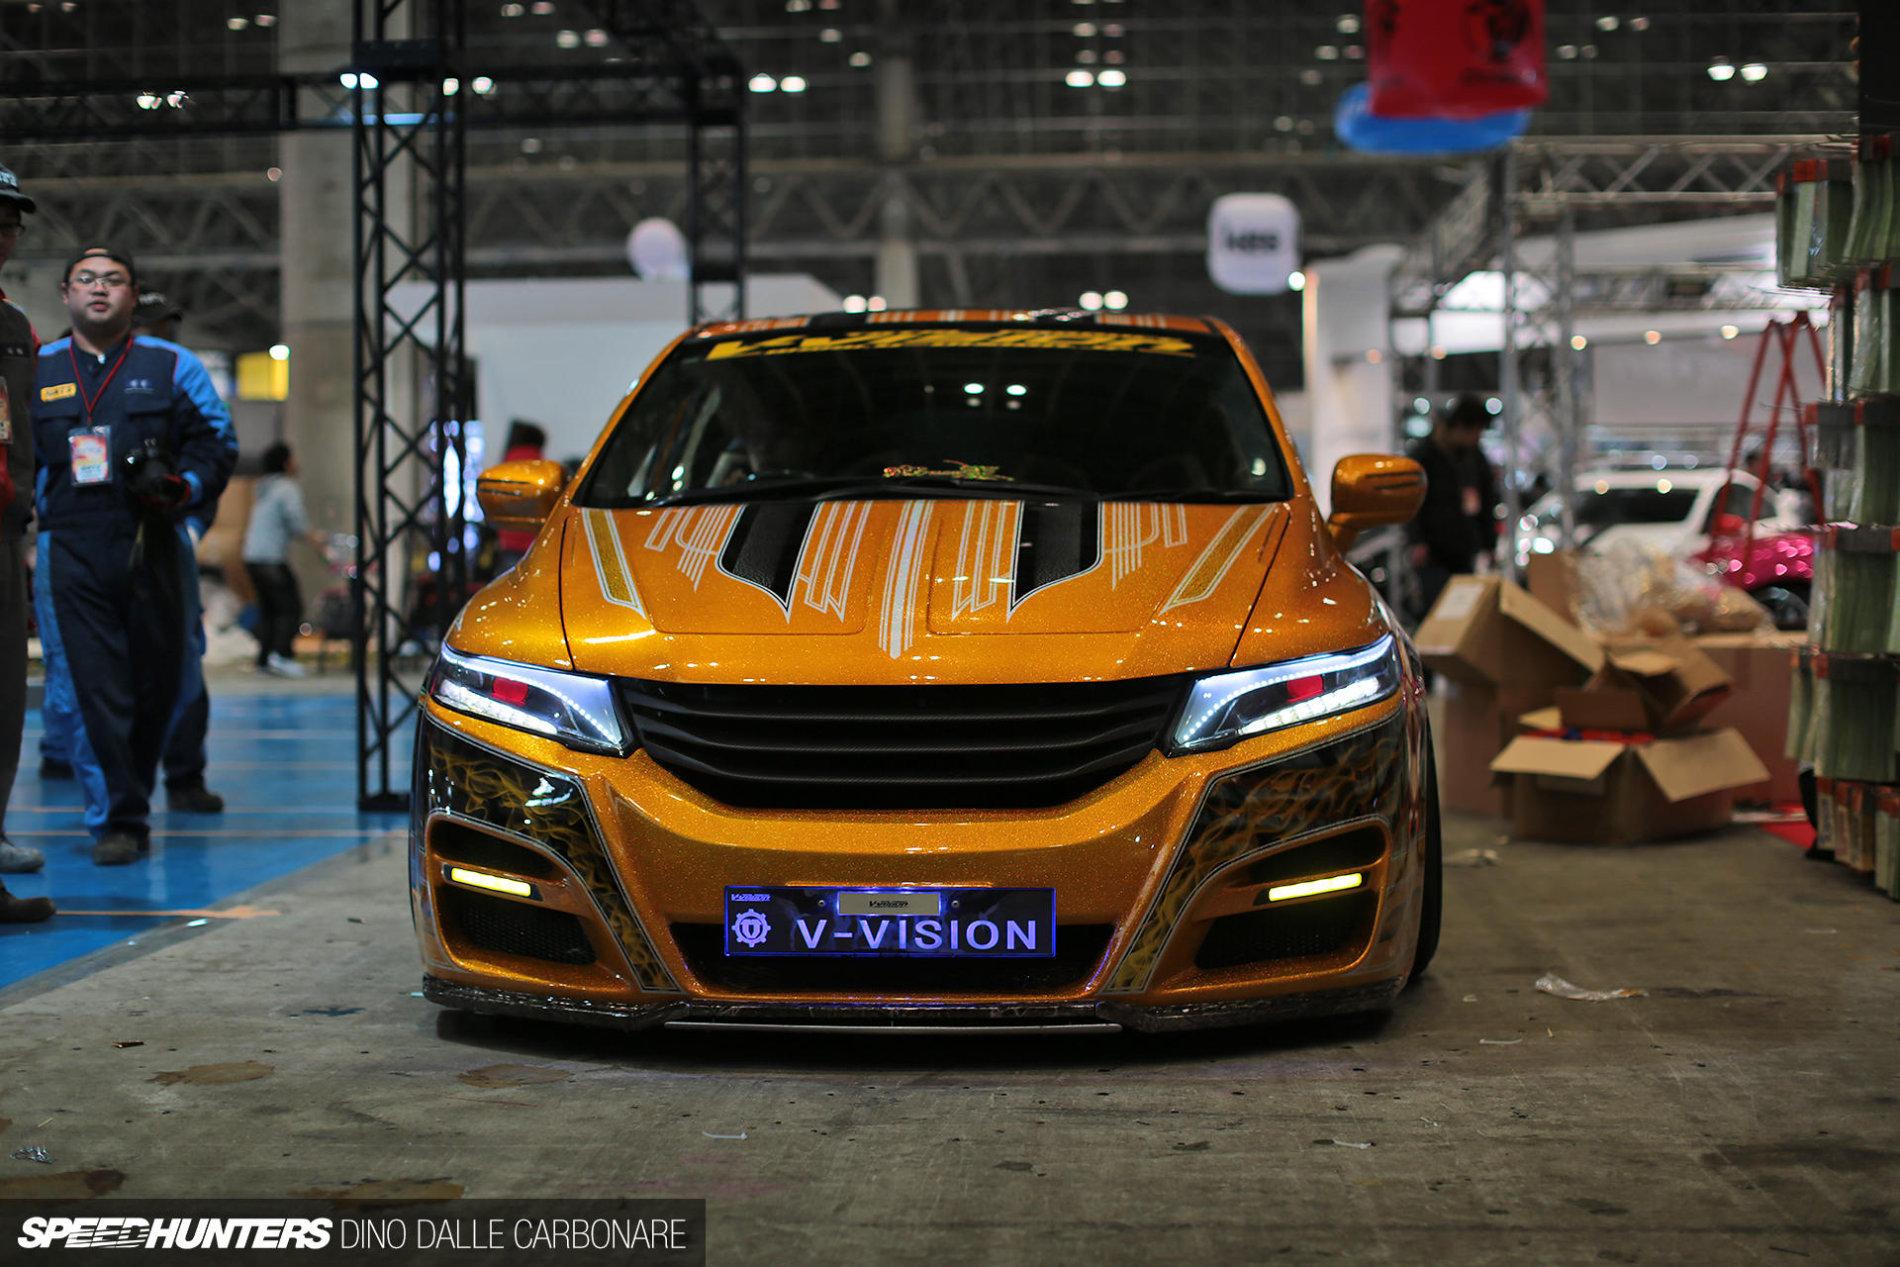 Tokyo Auto Salon 2014 - Tokyo Auto Salon 2014